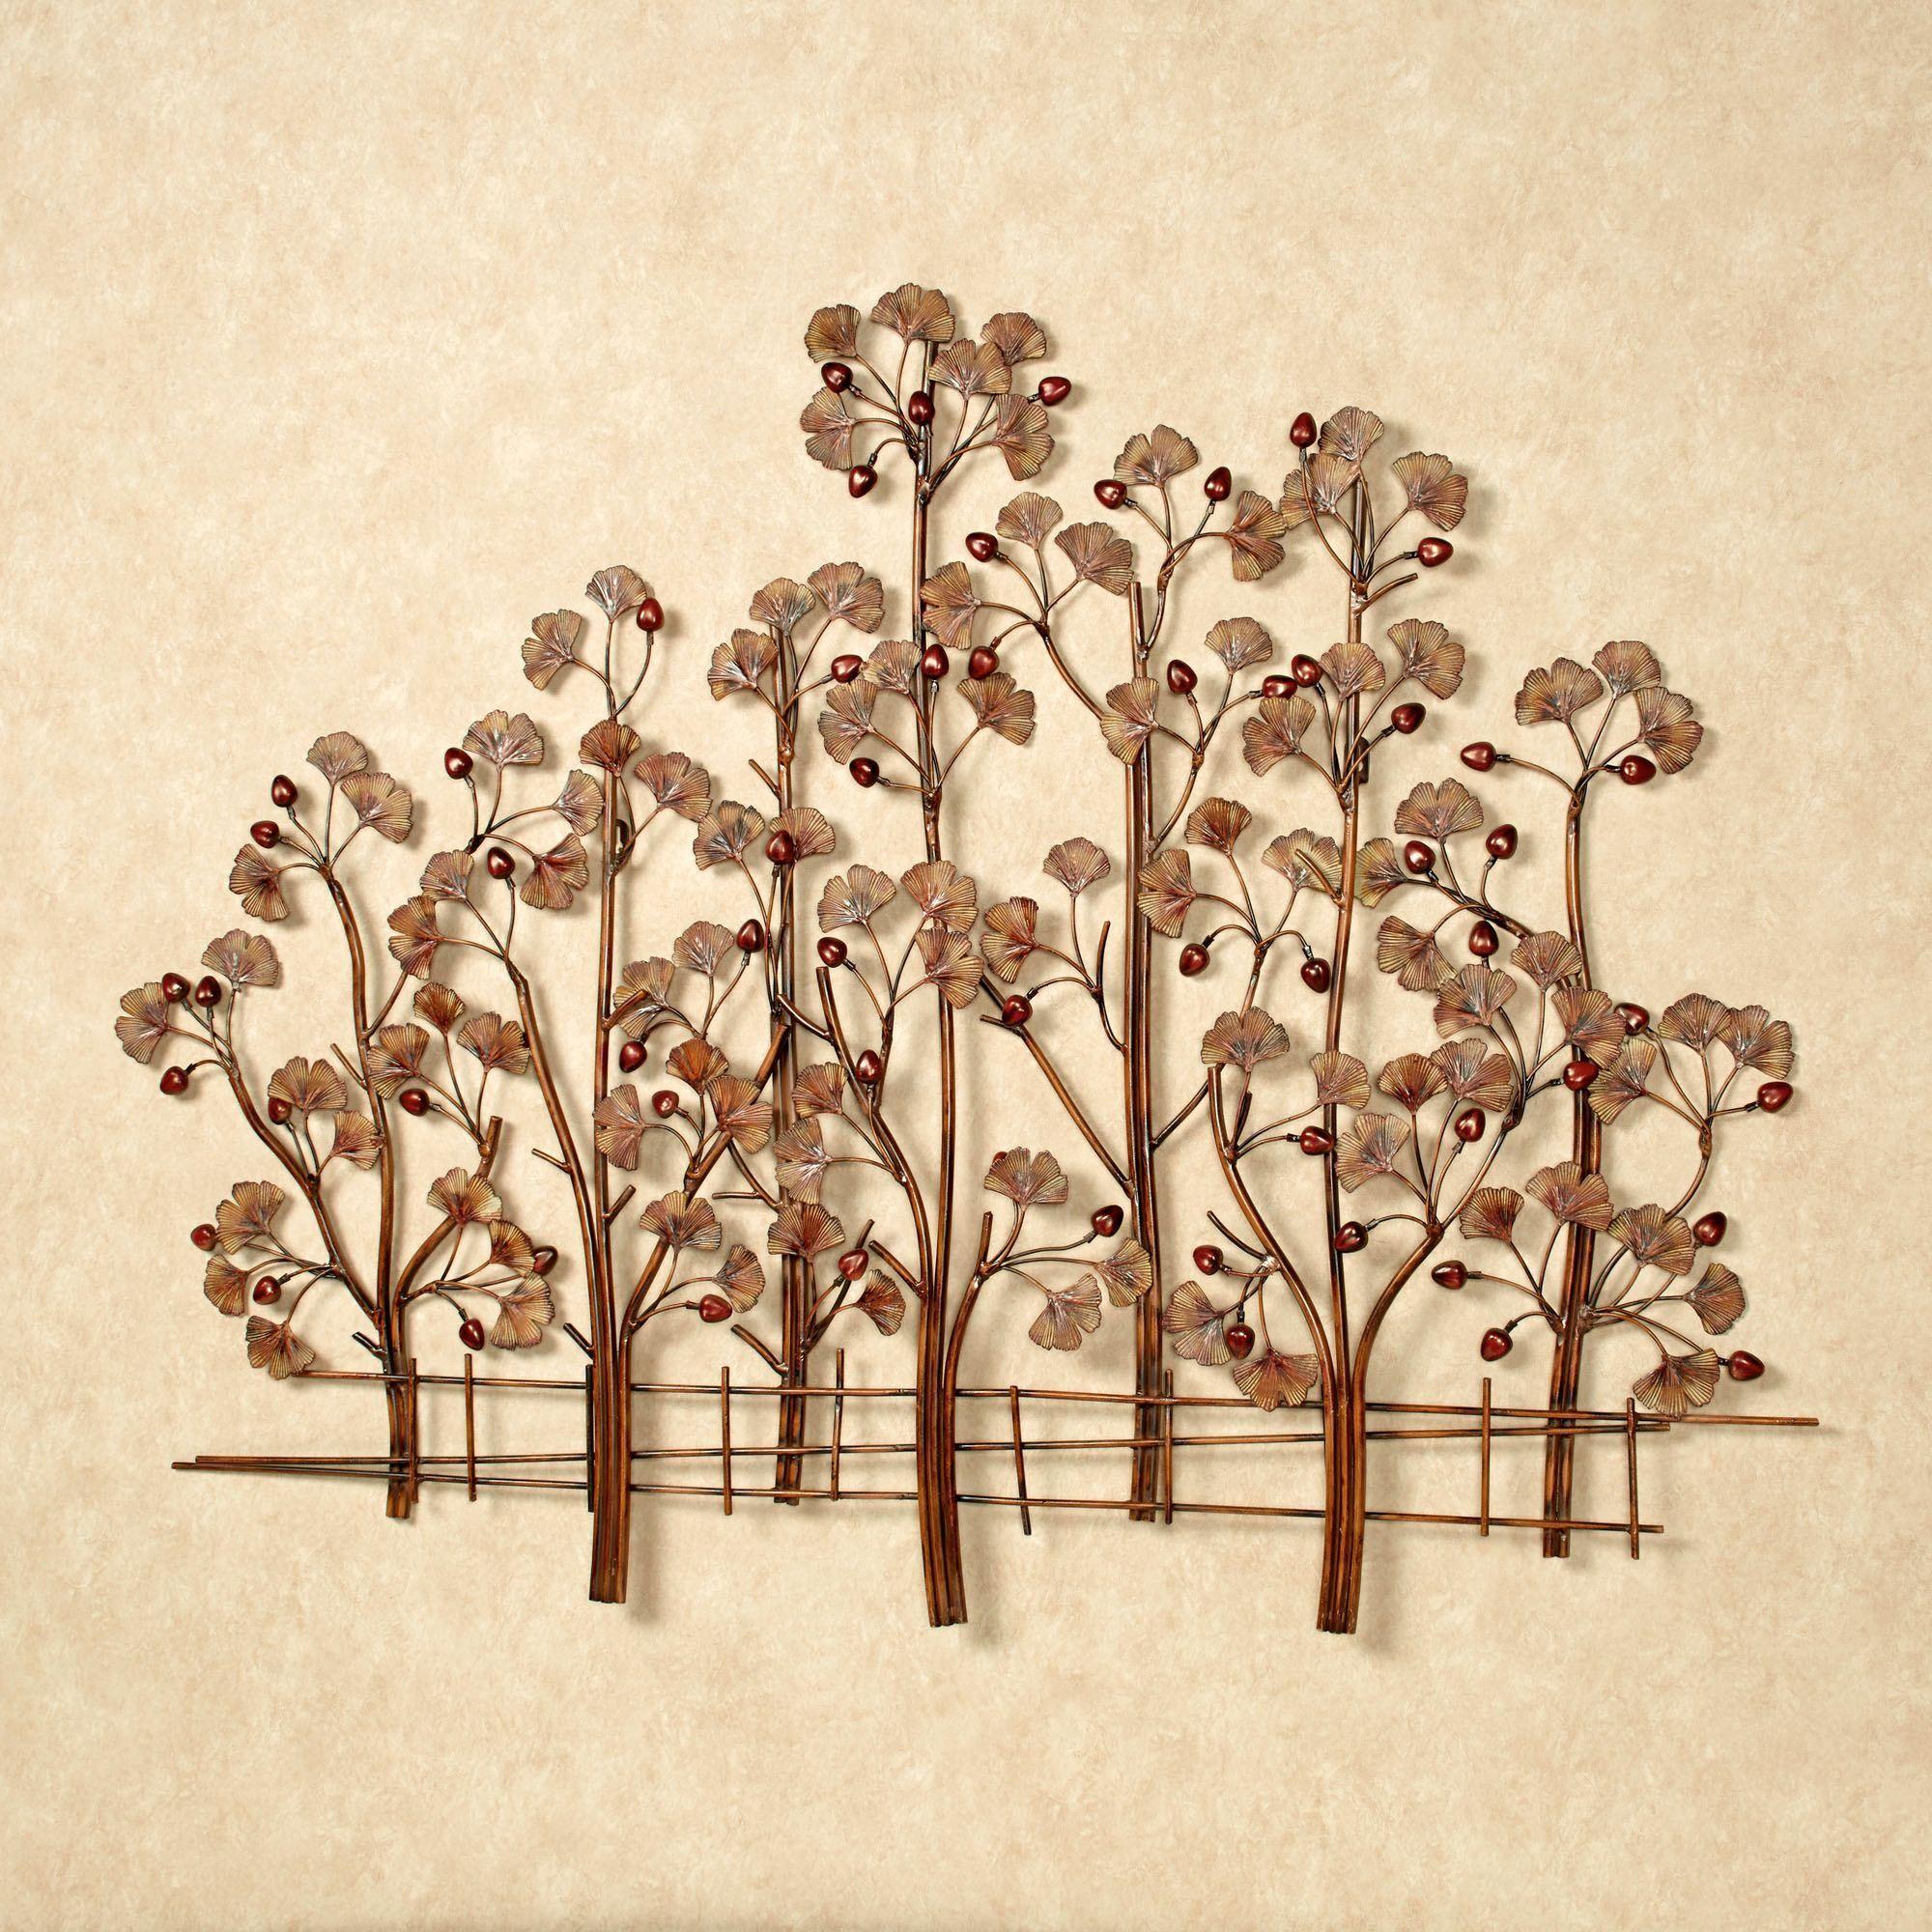 Rustic Metal Wall Art Sculptures Ginkgo Tree Metal Wall Sculpture